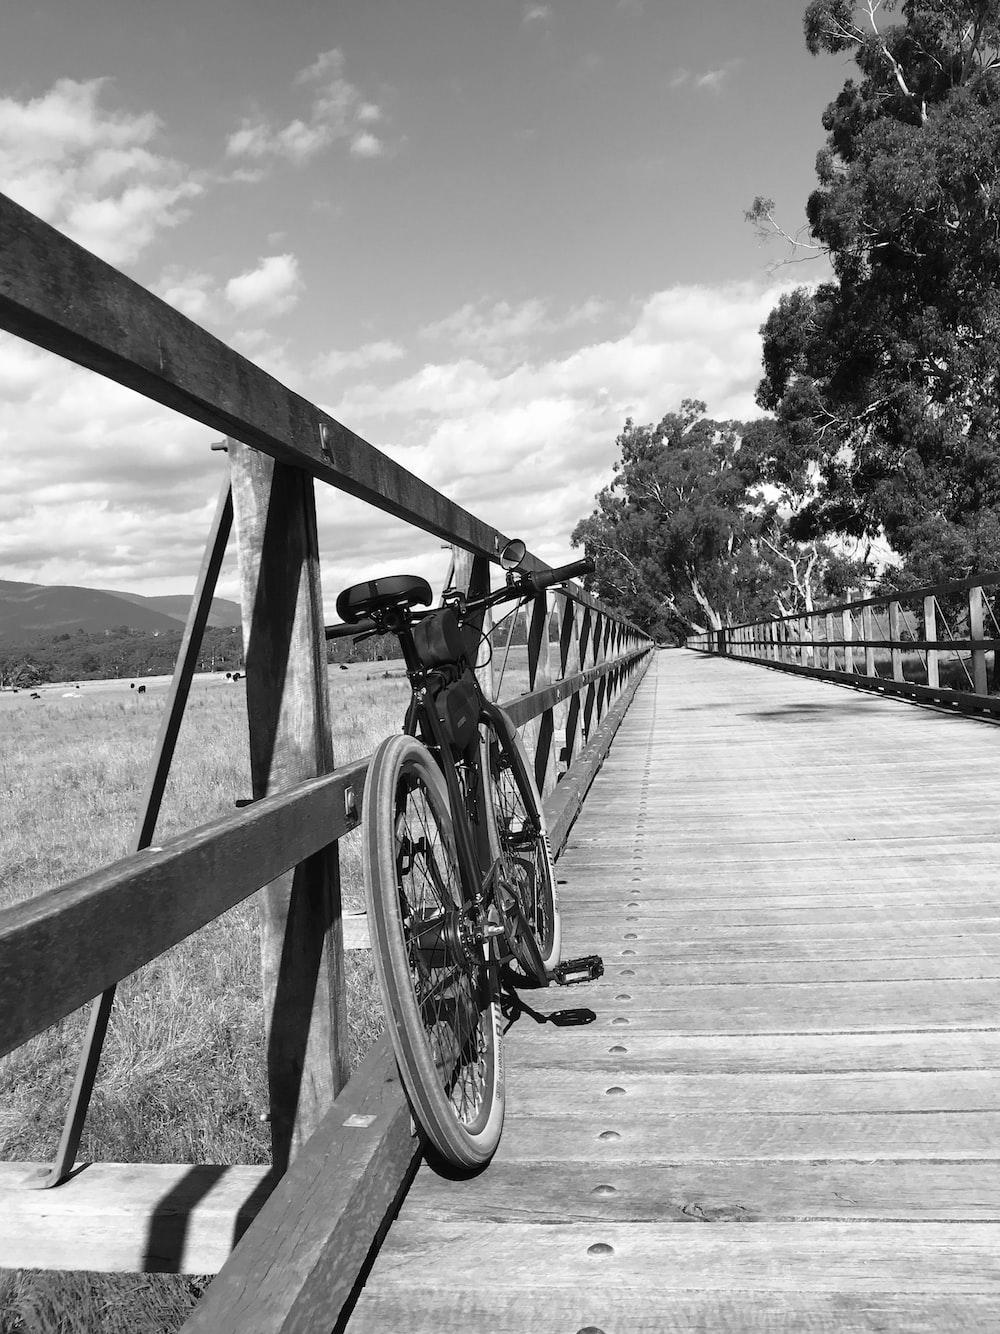 grayscale photo of bicycle on wooden bridge